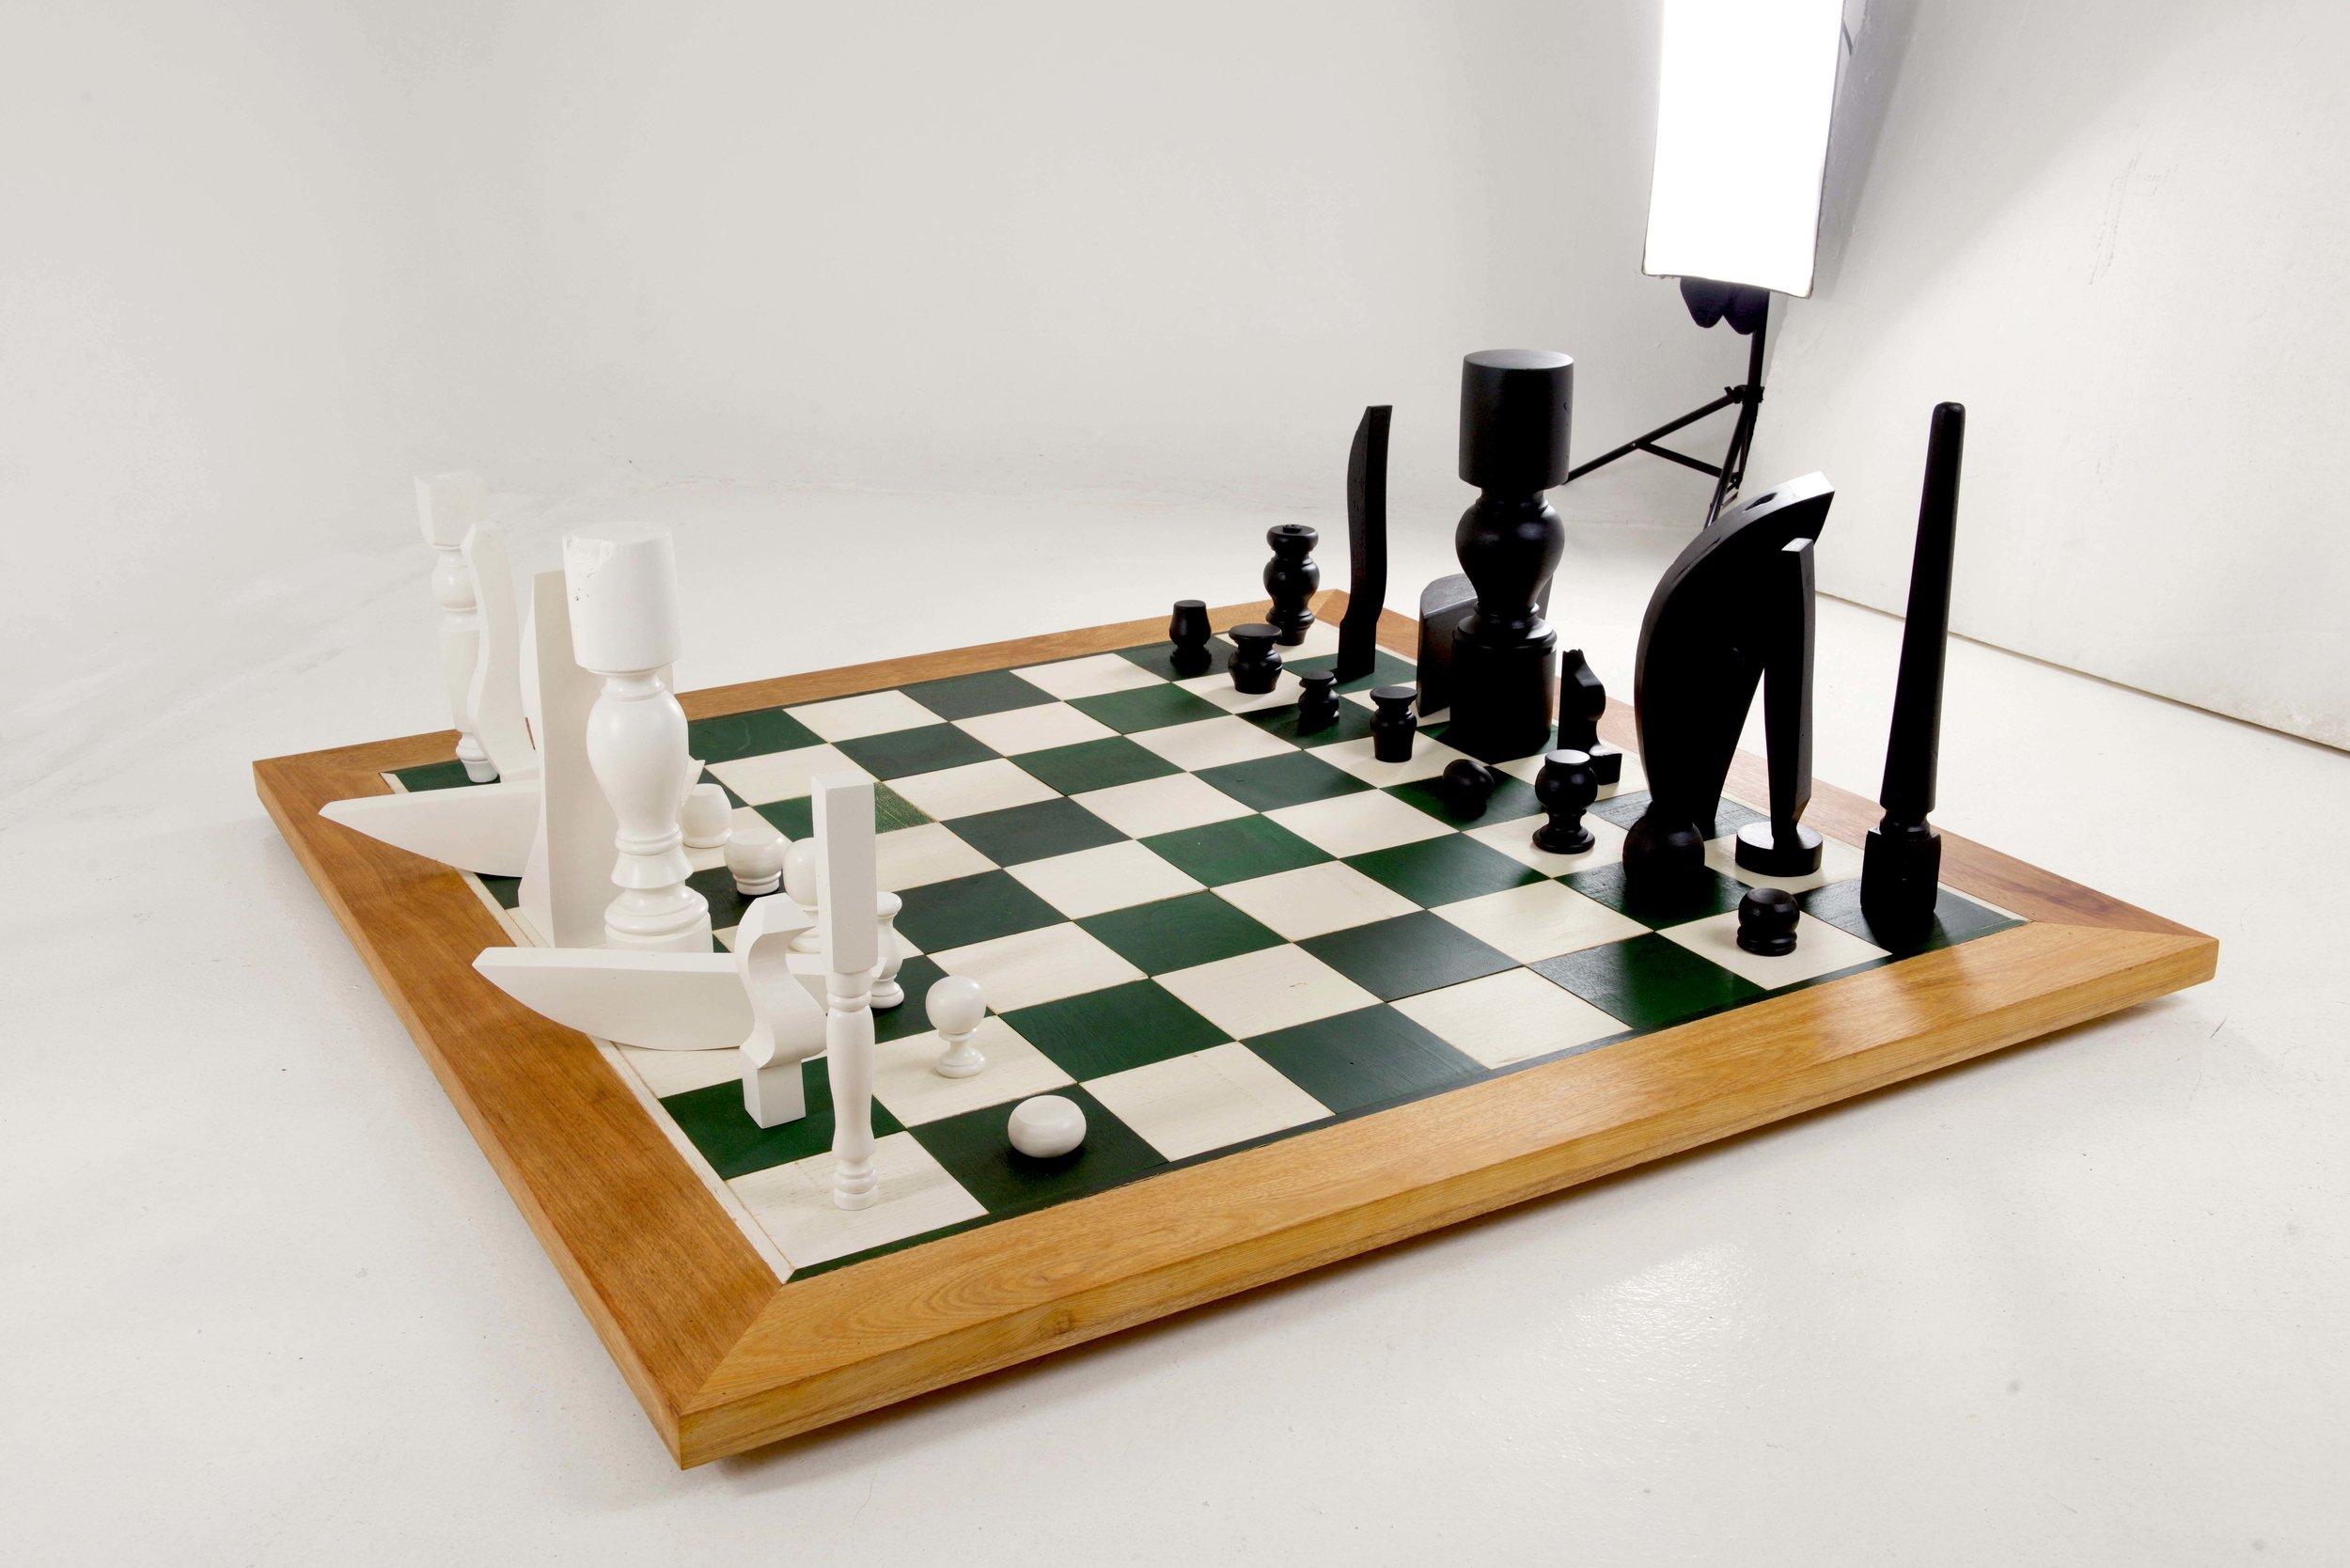 Chess_set_2560pxl_6.jpg